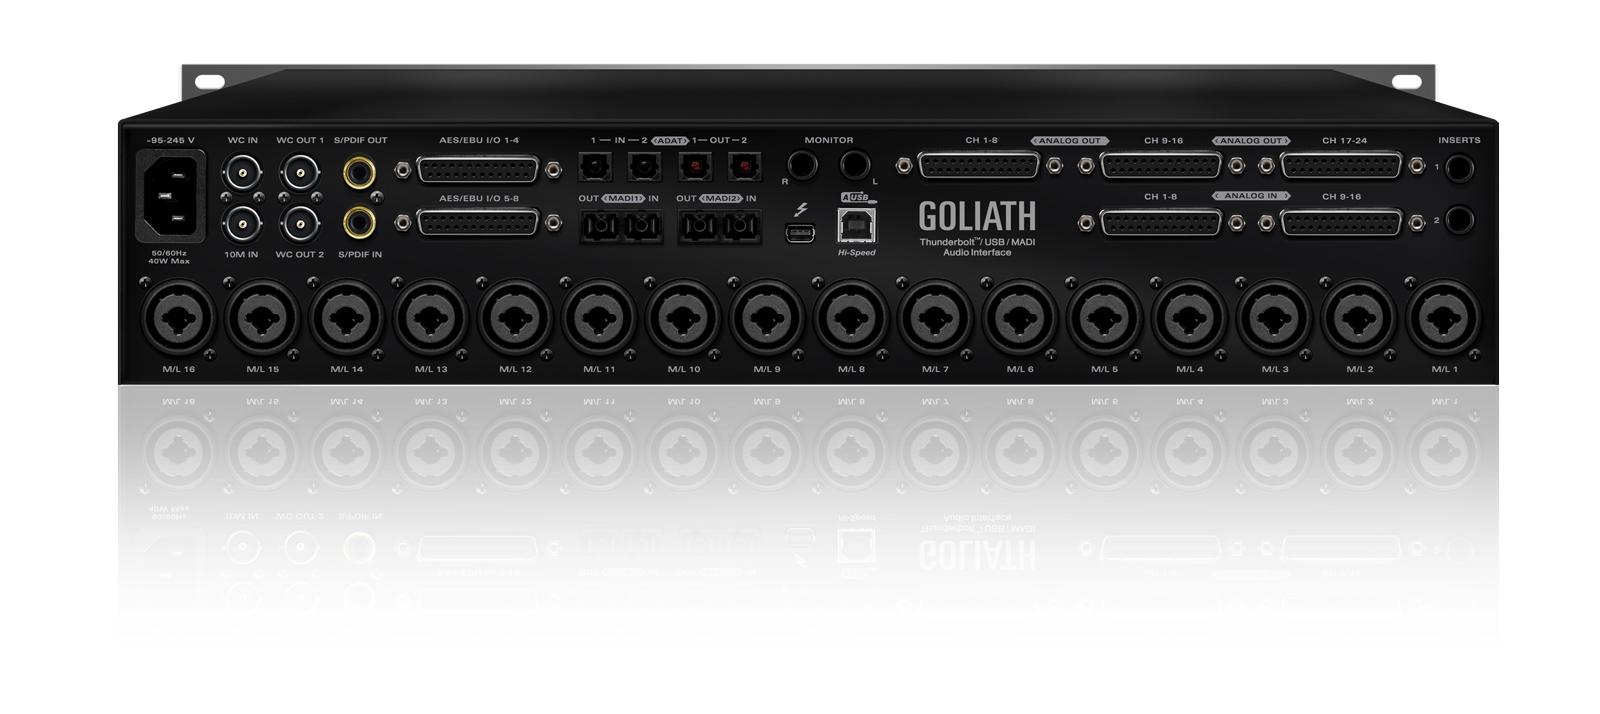 Cherry Master Wiring Diagram Switch Diagrams Lighting Goliath Thunderbolt Usb Madi Audio Interface Antelope On